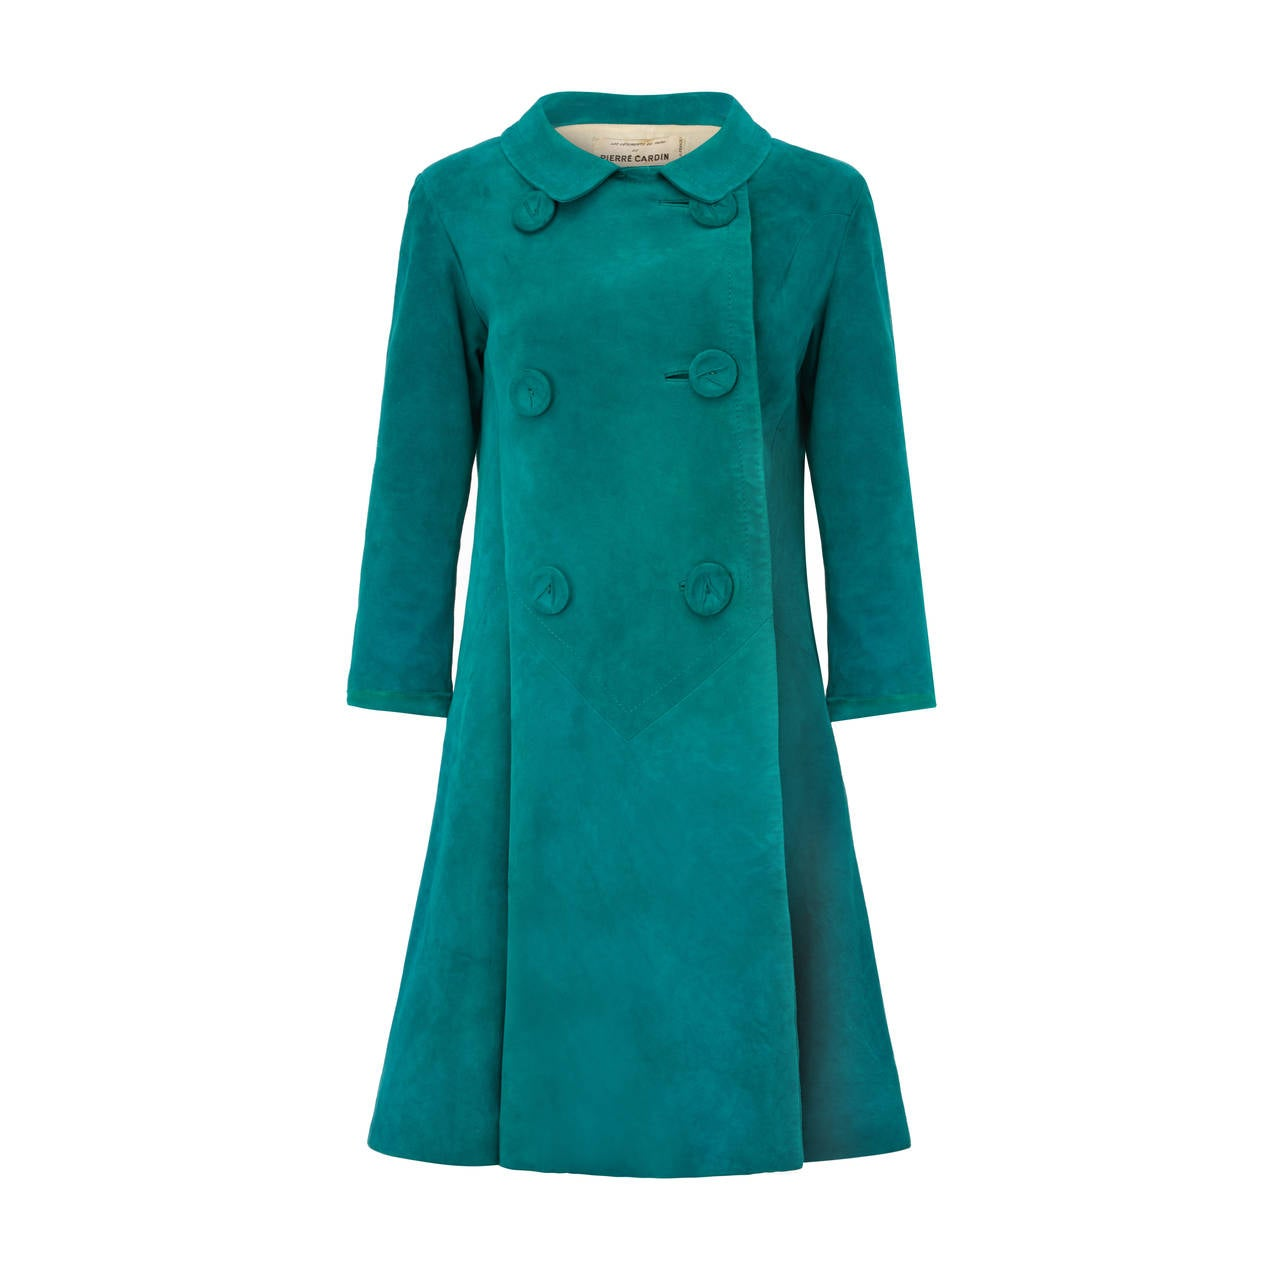 1960s Pierre Cardin Teal Suede Jacket 1